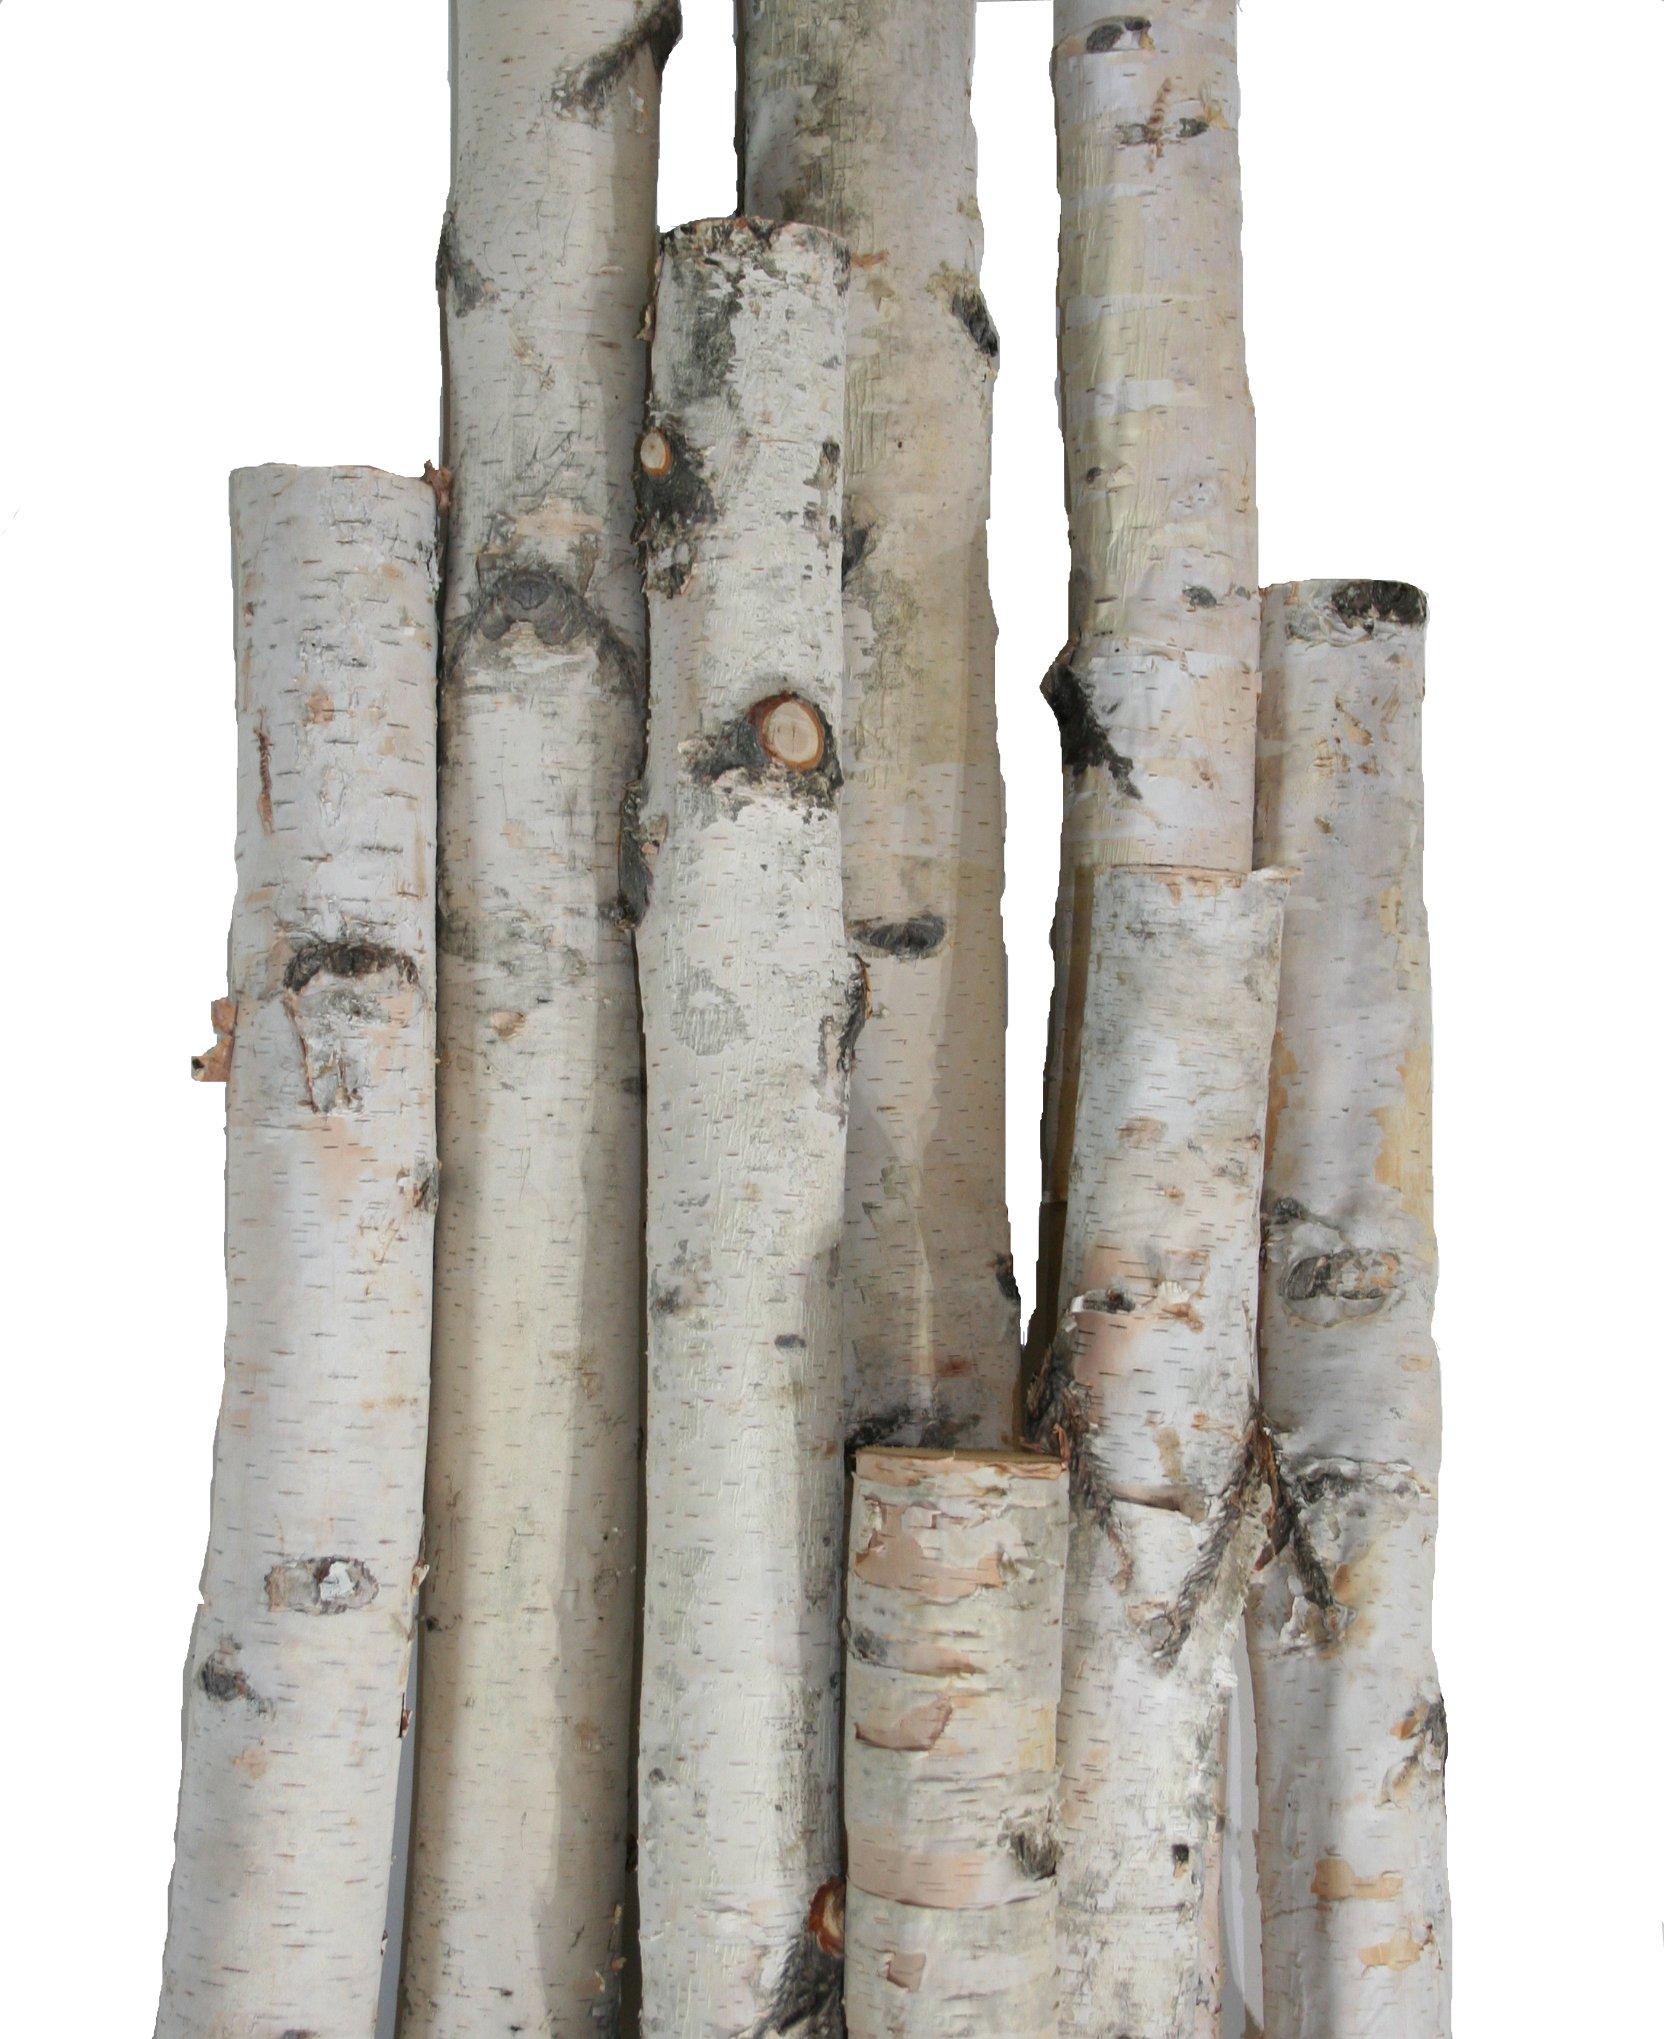 Wilson Enterprises White Birch Pole Pack (Large) Set of 3 White Birch Poles: 1.5-2.5 inch diameter x 5, 6, and 7 feet long